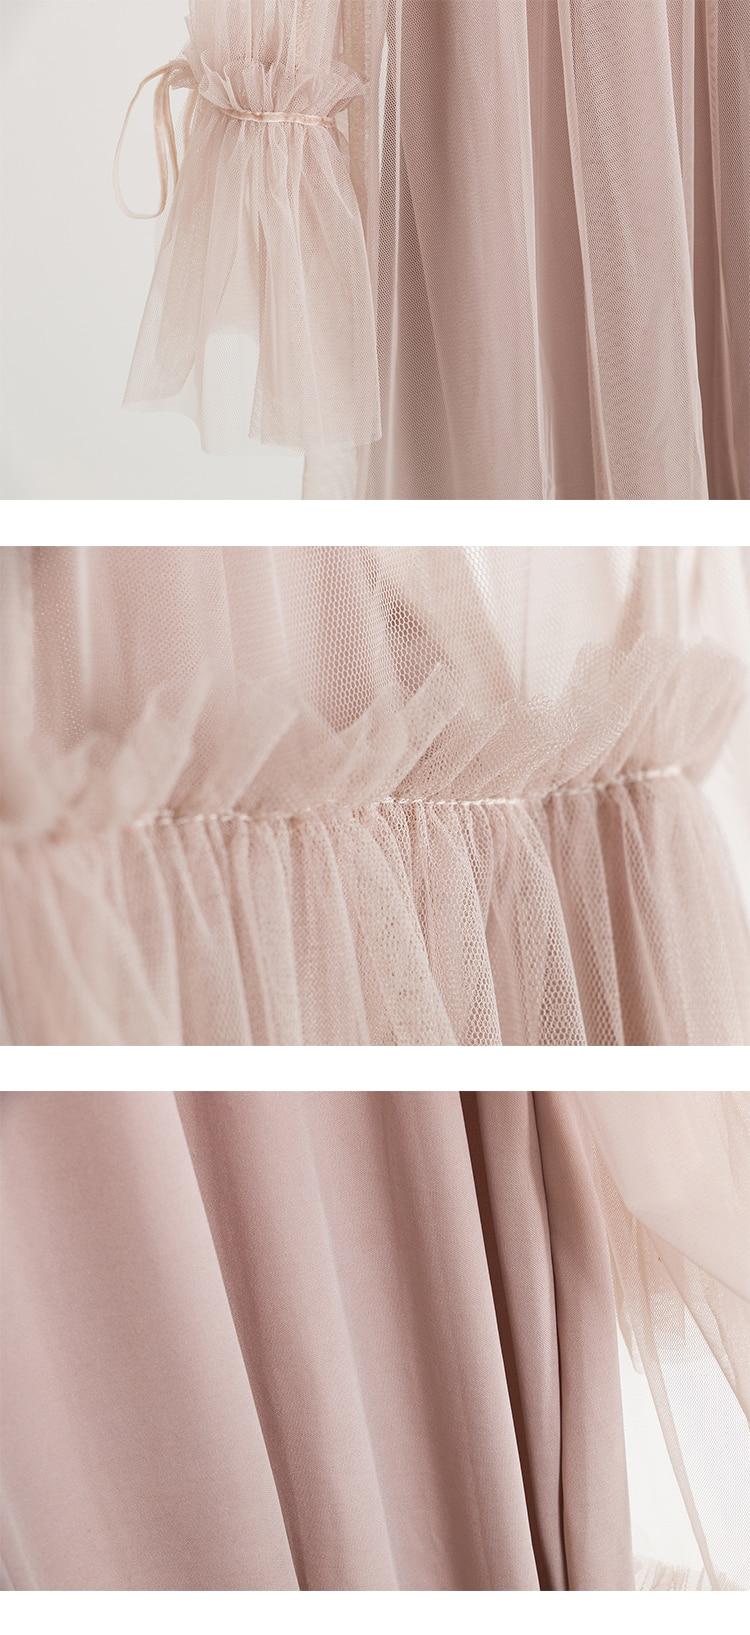 2017 Autumn new female elegant aesthetic loose gauze ruffle hem loose pleated one-piece dress women's doll dresses 9